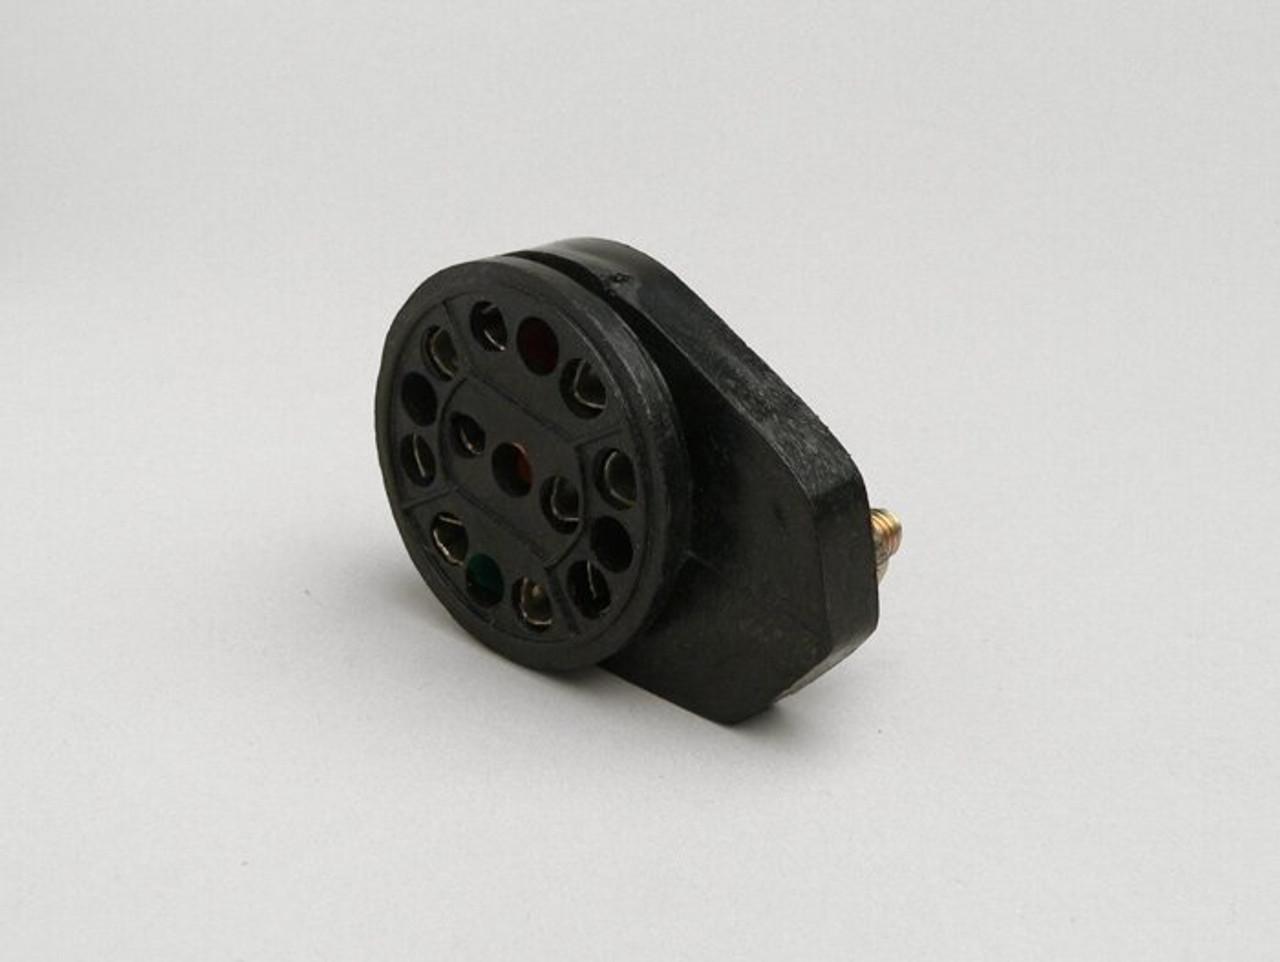 Lambretta Ignition Junction Box AC Casa (G113-8012210)